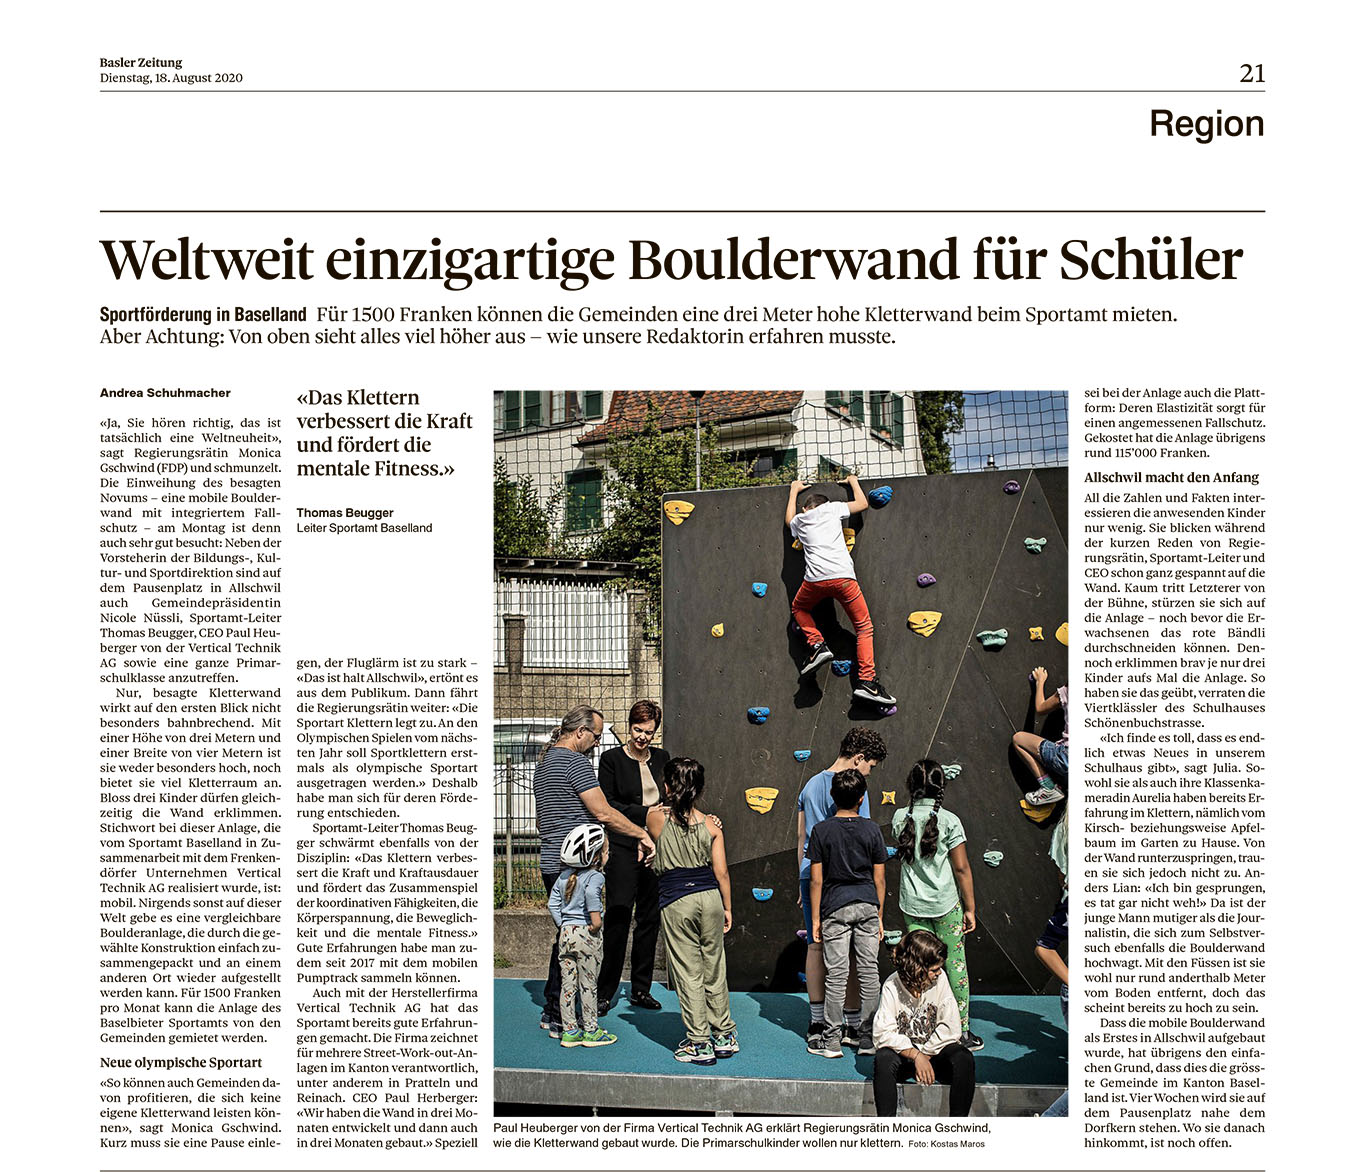 1597729805507_USR1_Seiten_20_21_BAZ___Basler_Zeitung__main_Edition__2020_08_18.jpg